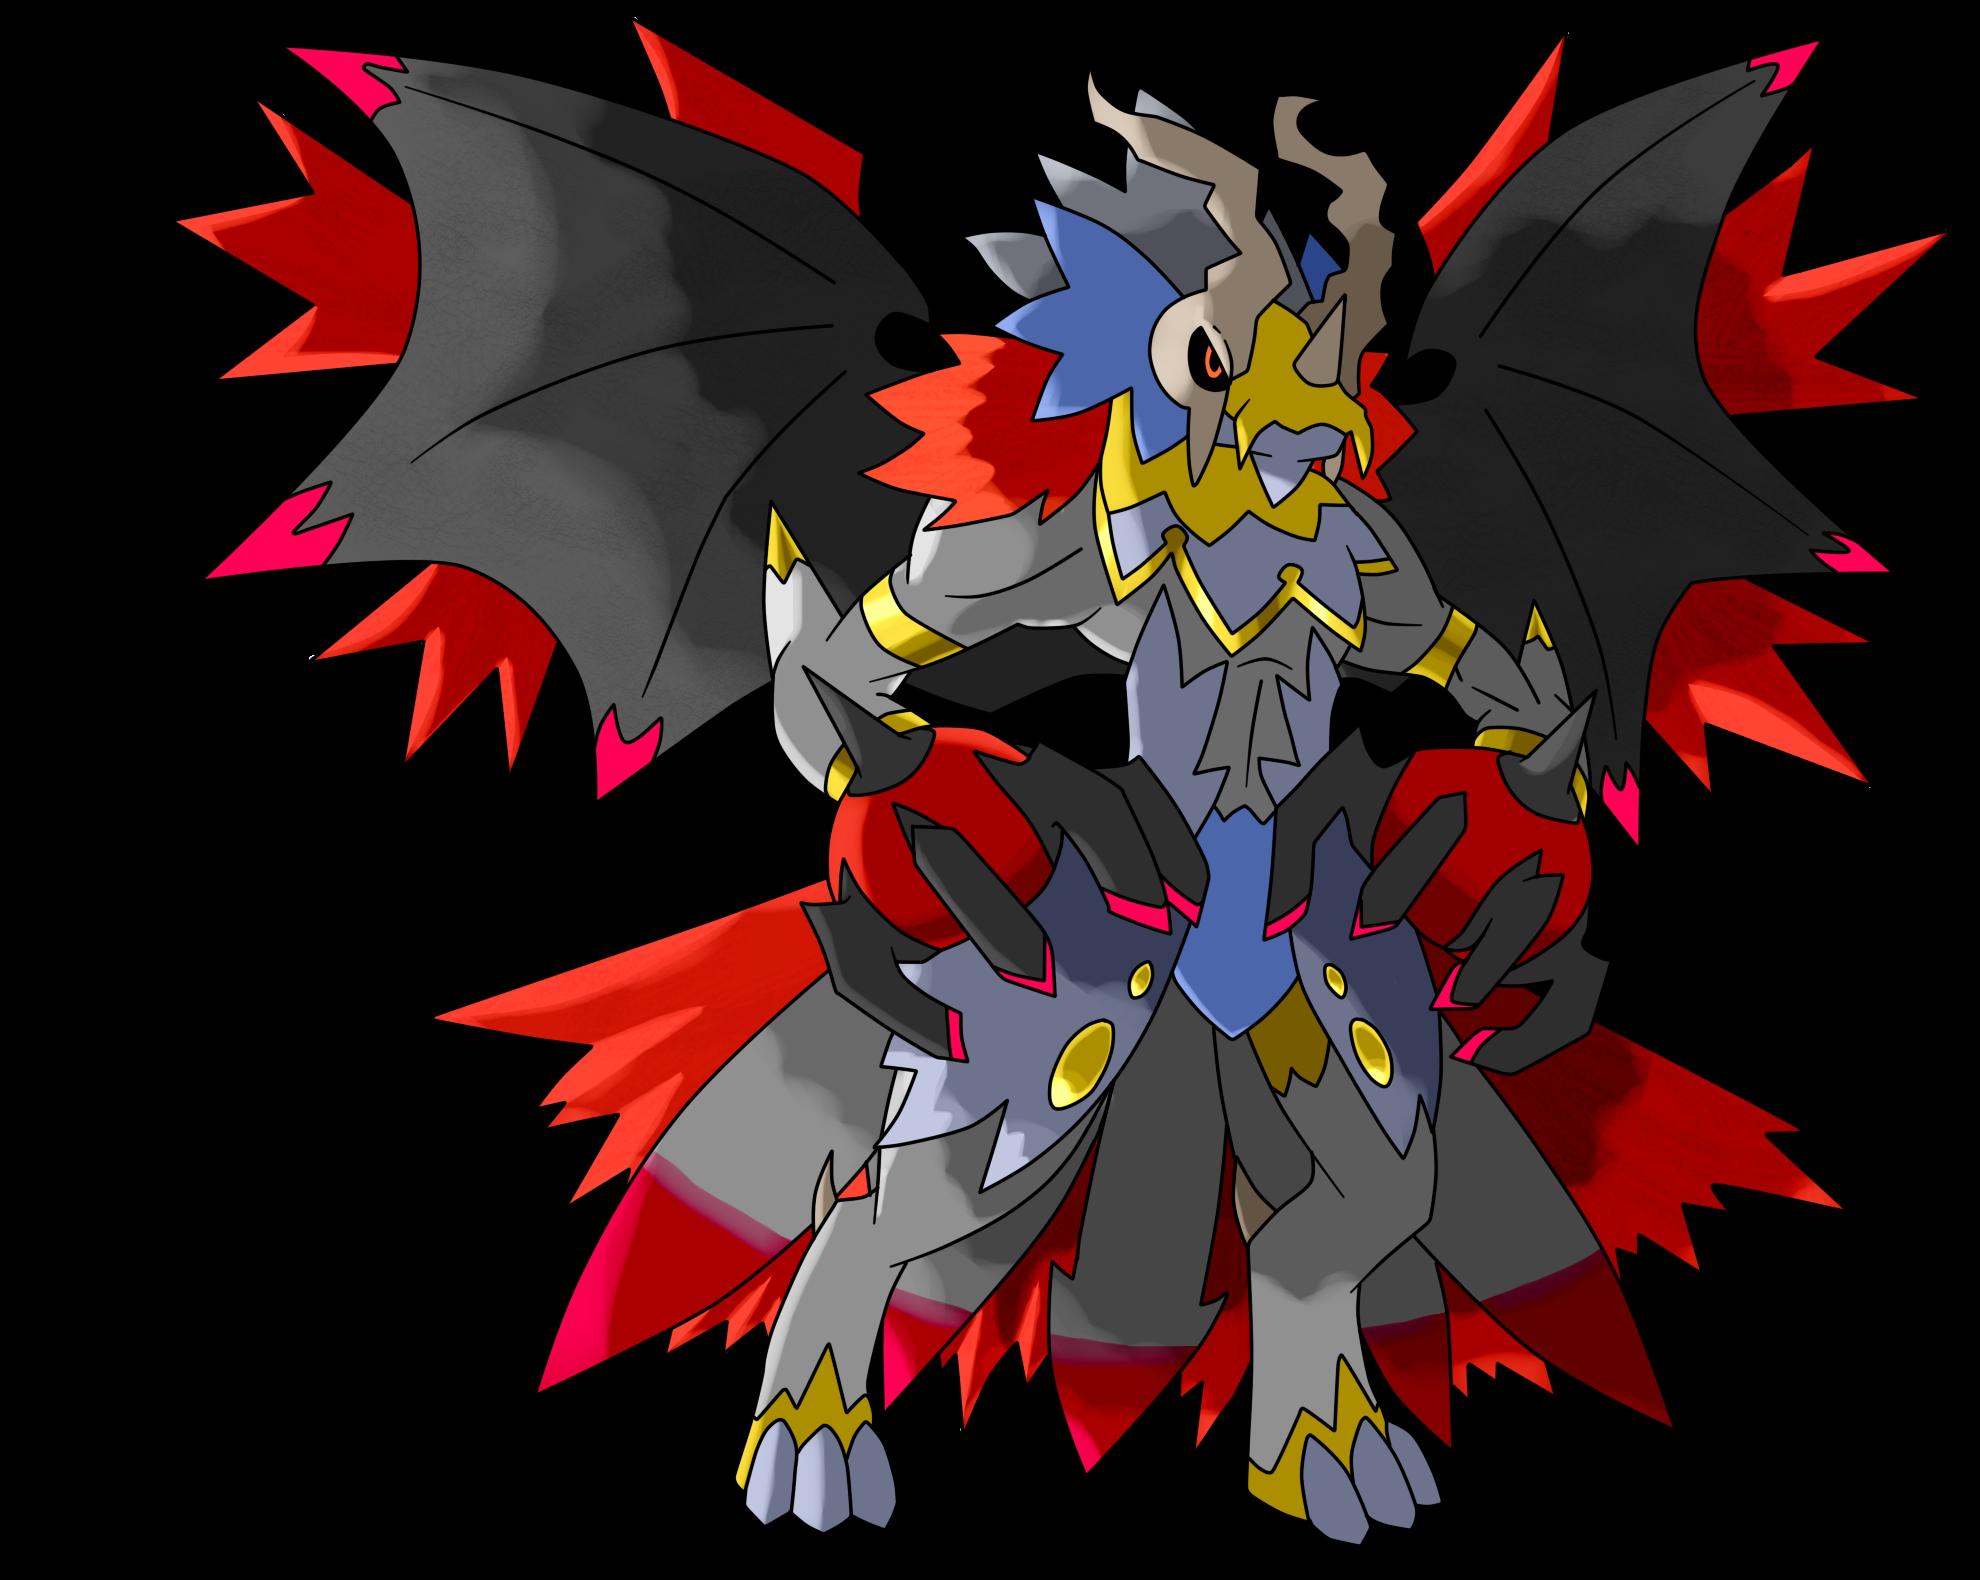 legendary fakemon based on the 7 sins pokemon